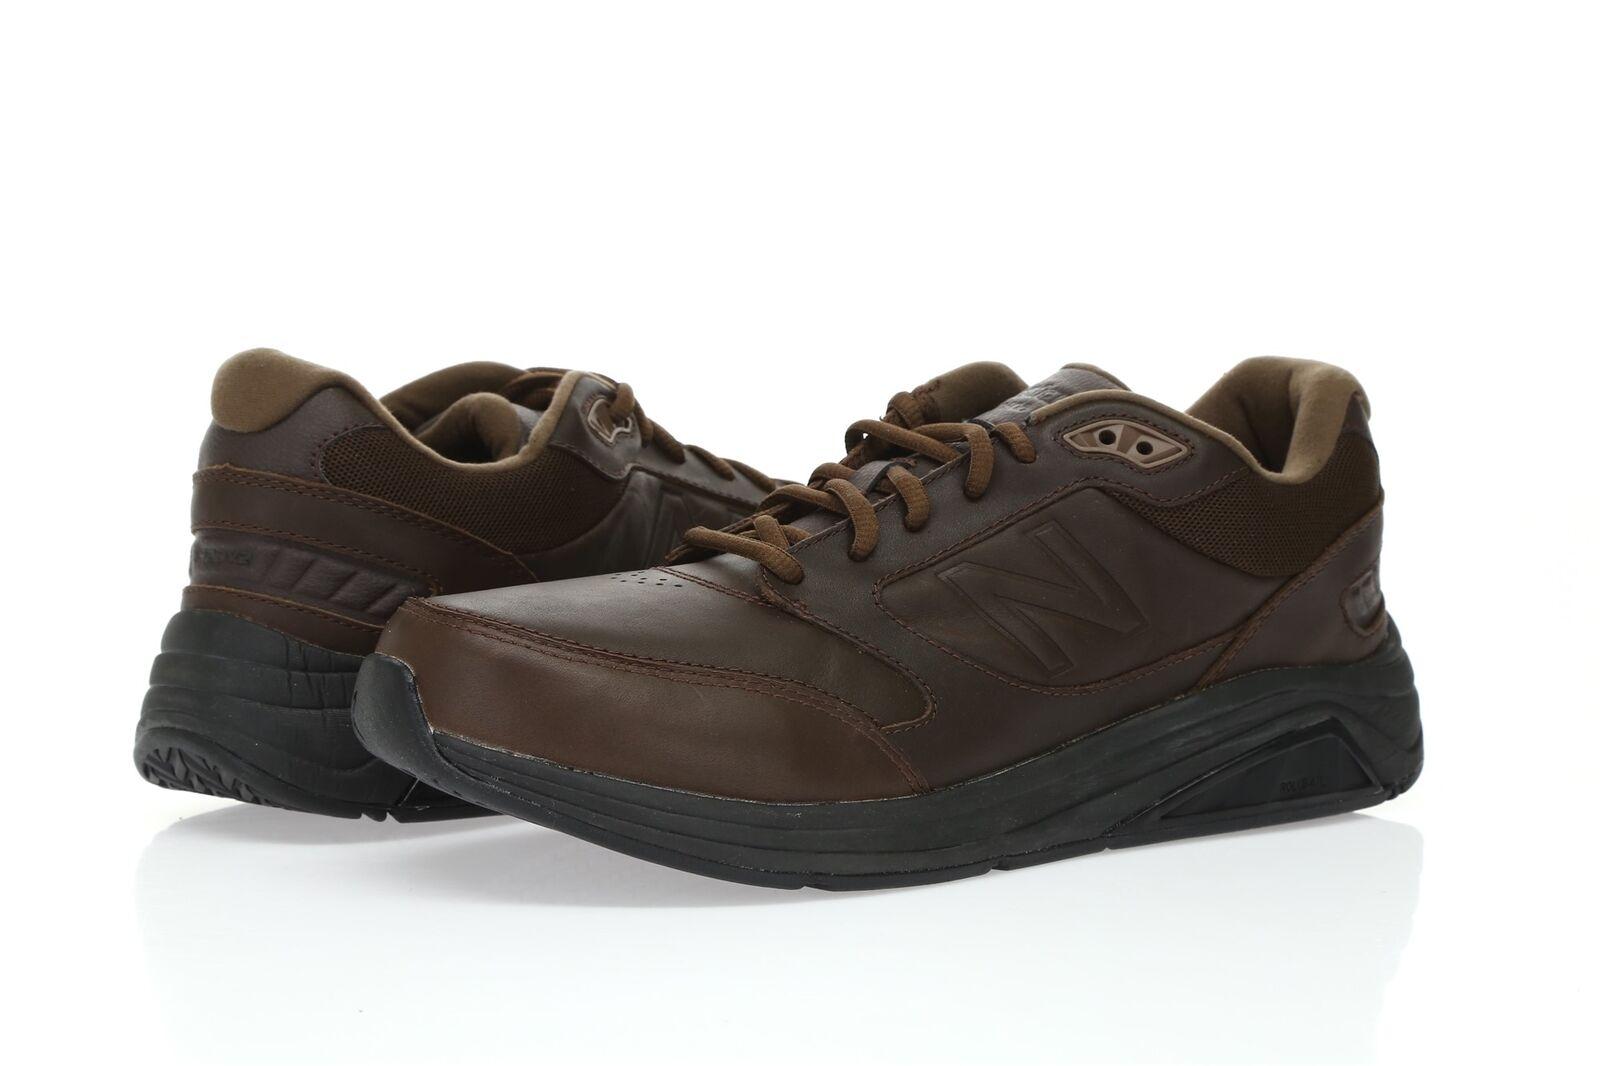 New Balance Marche Men's brown walking sneakers sz. 9.5 D